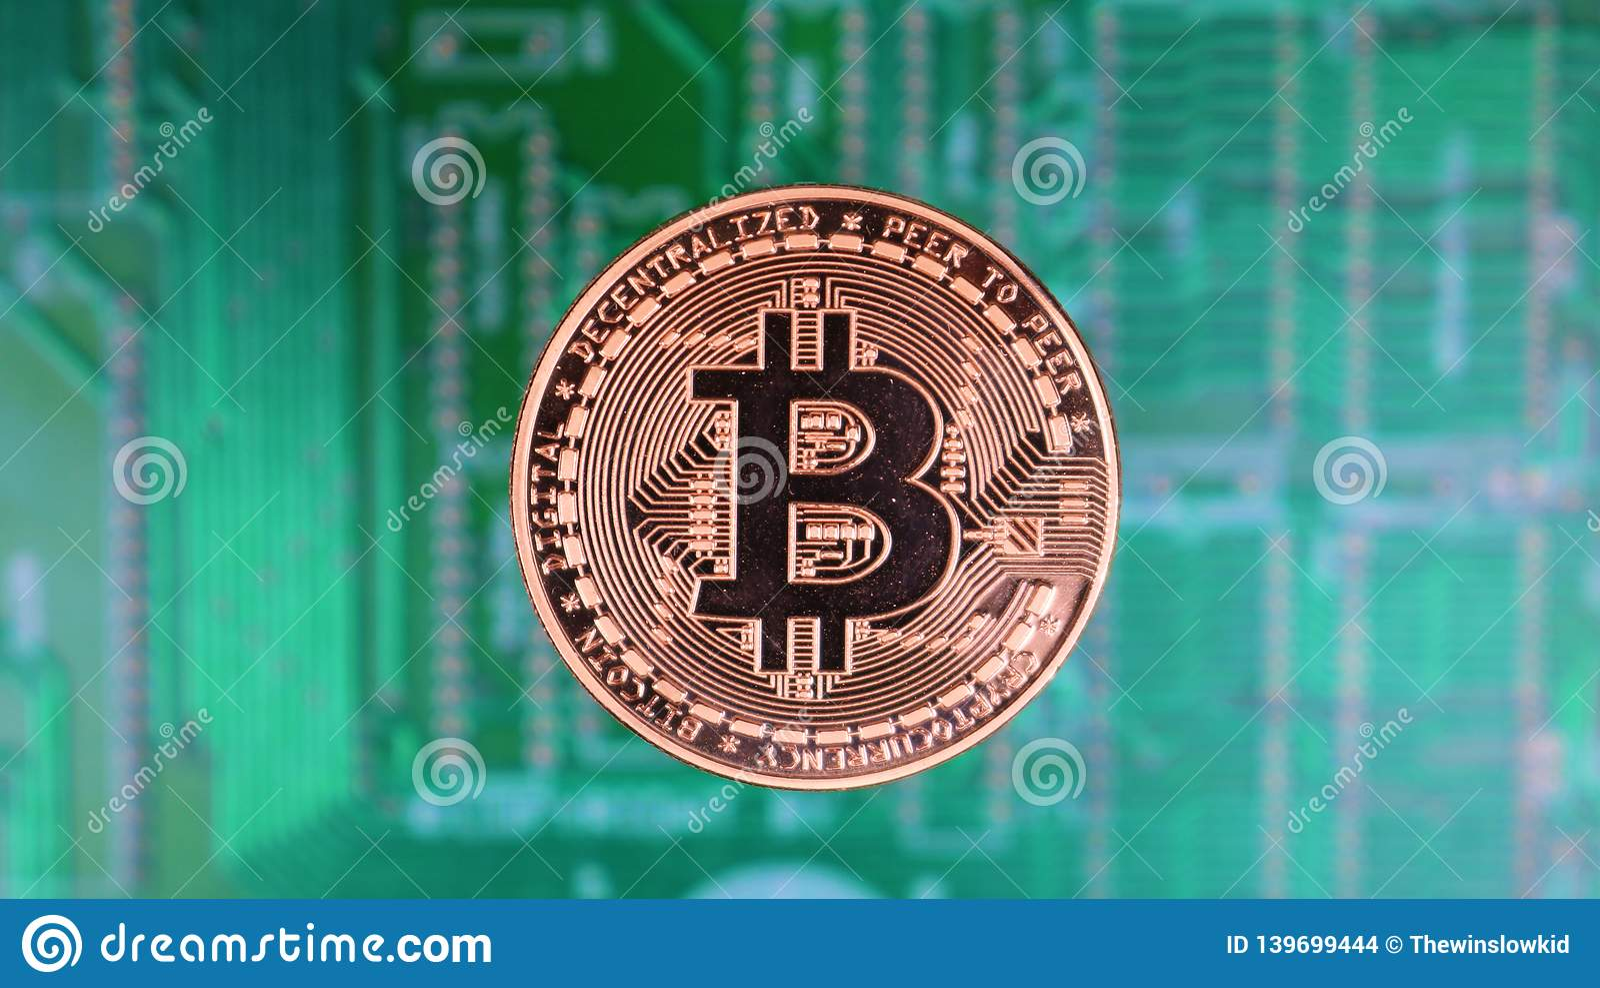 bitcoin pe pc